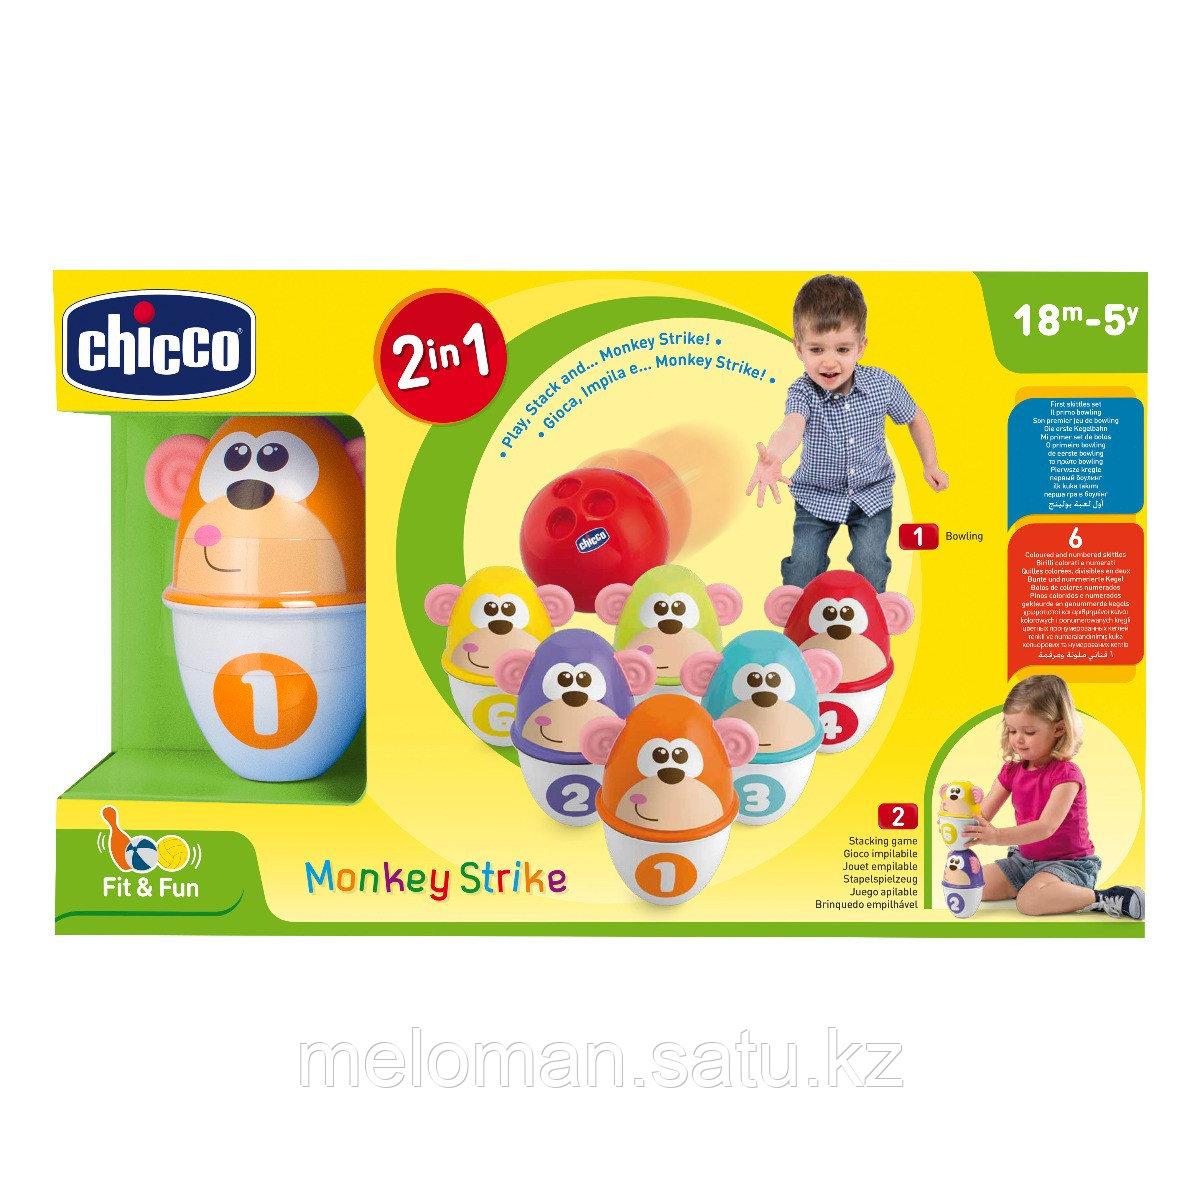 "Chicco: Боулинг Monkey Strike 2 в 1 ""Fit&Fun"", 18м+ - фото 8"